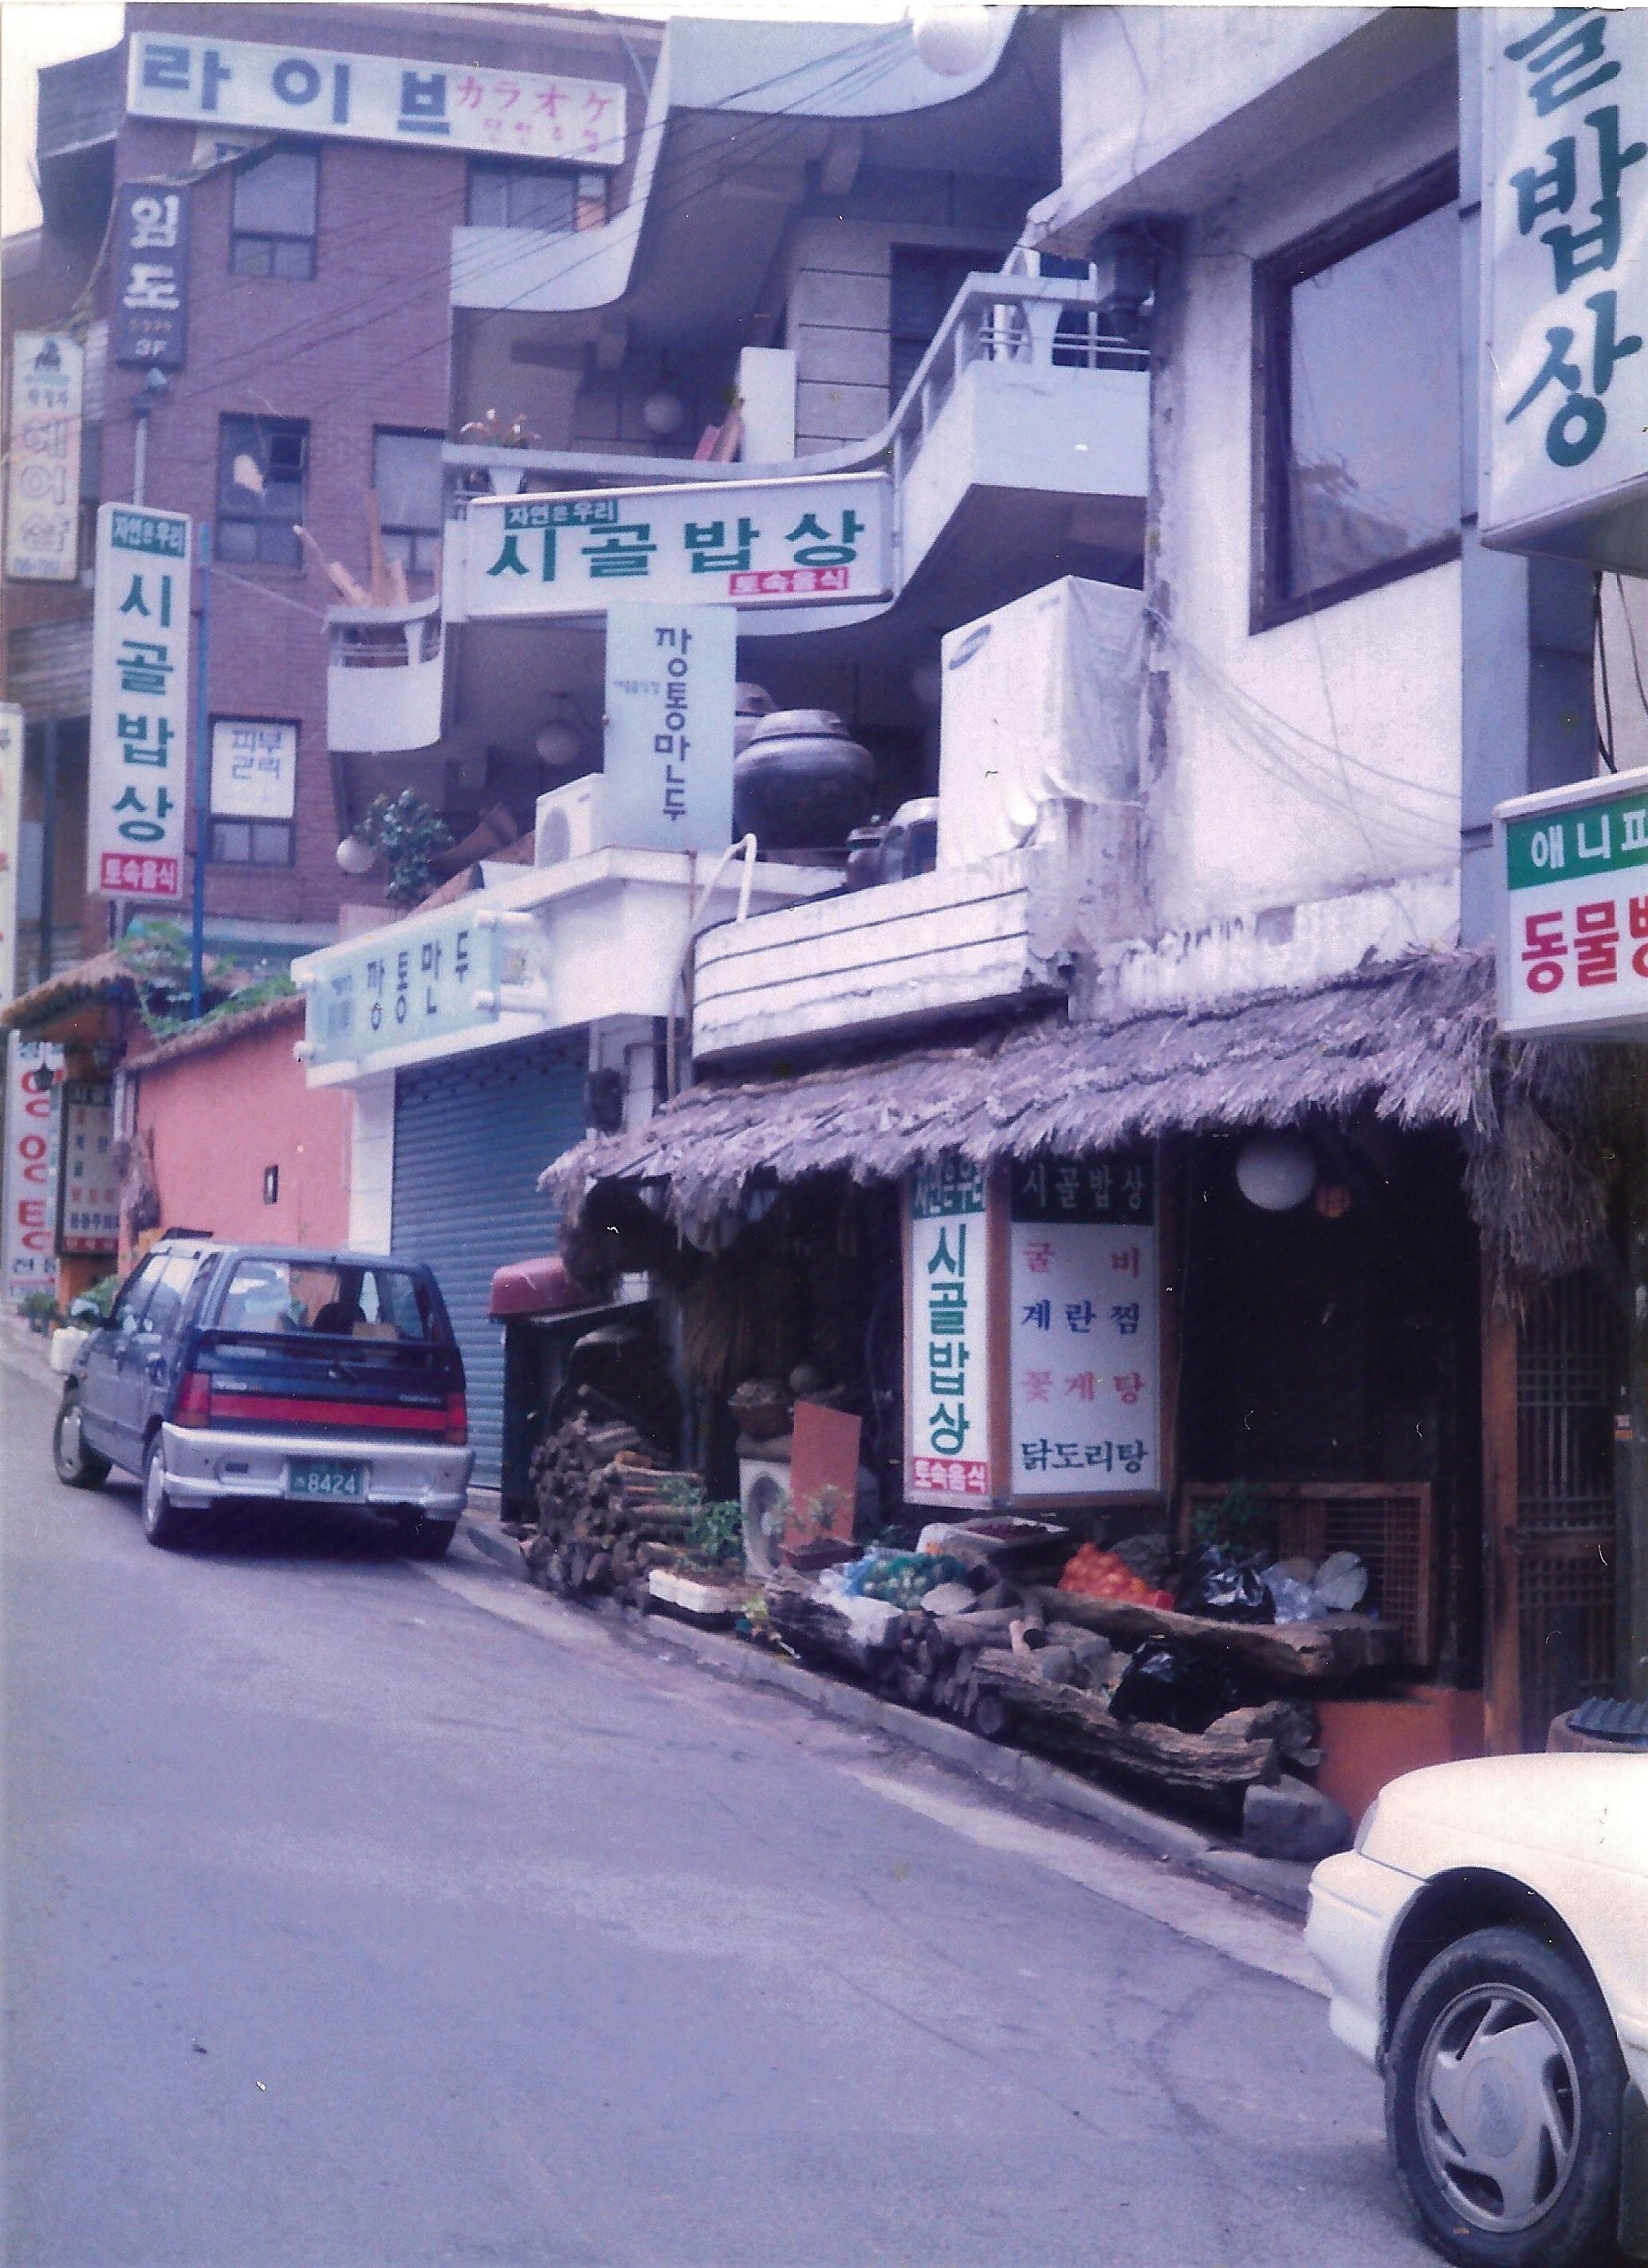 Korea vege 2 001 (2)